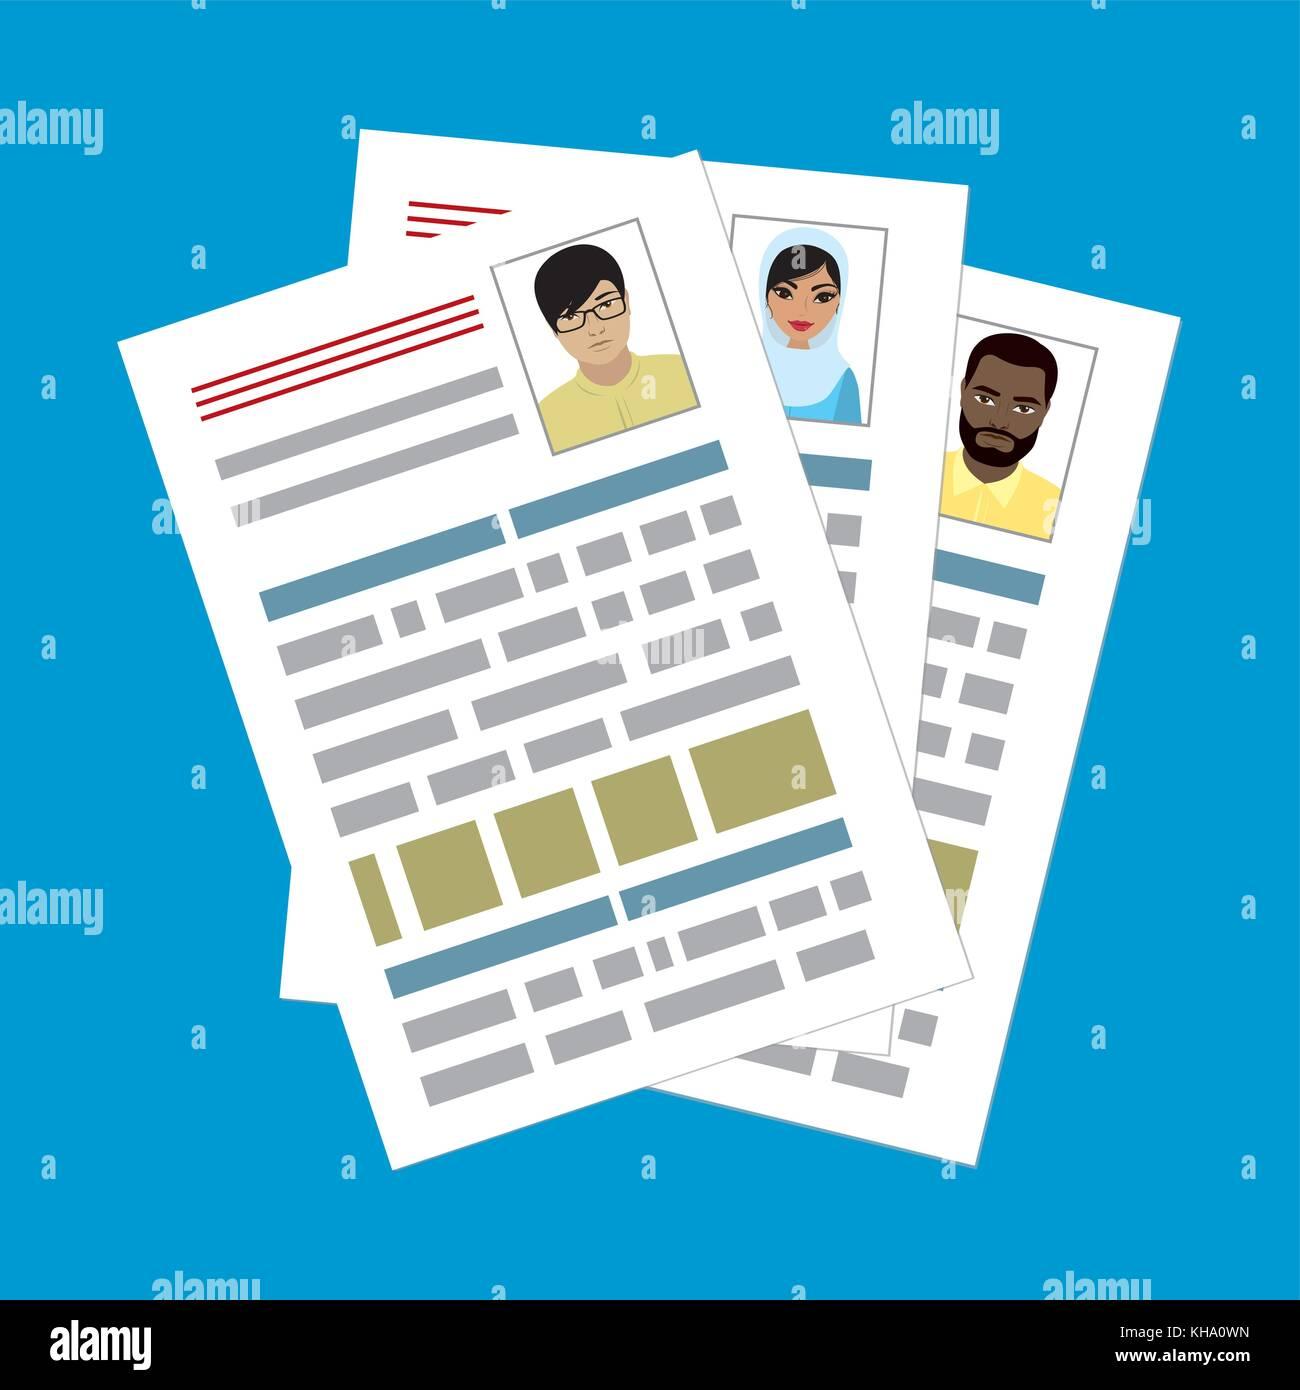 Job Position Imágenes De Stock & Job Position Fotos De Stock - Alamy